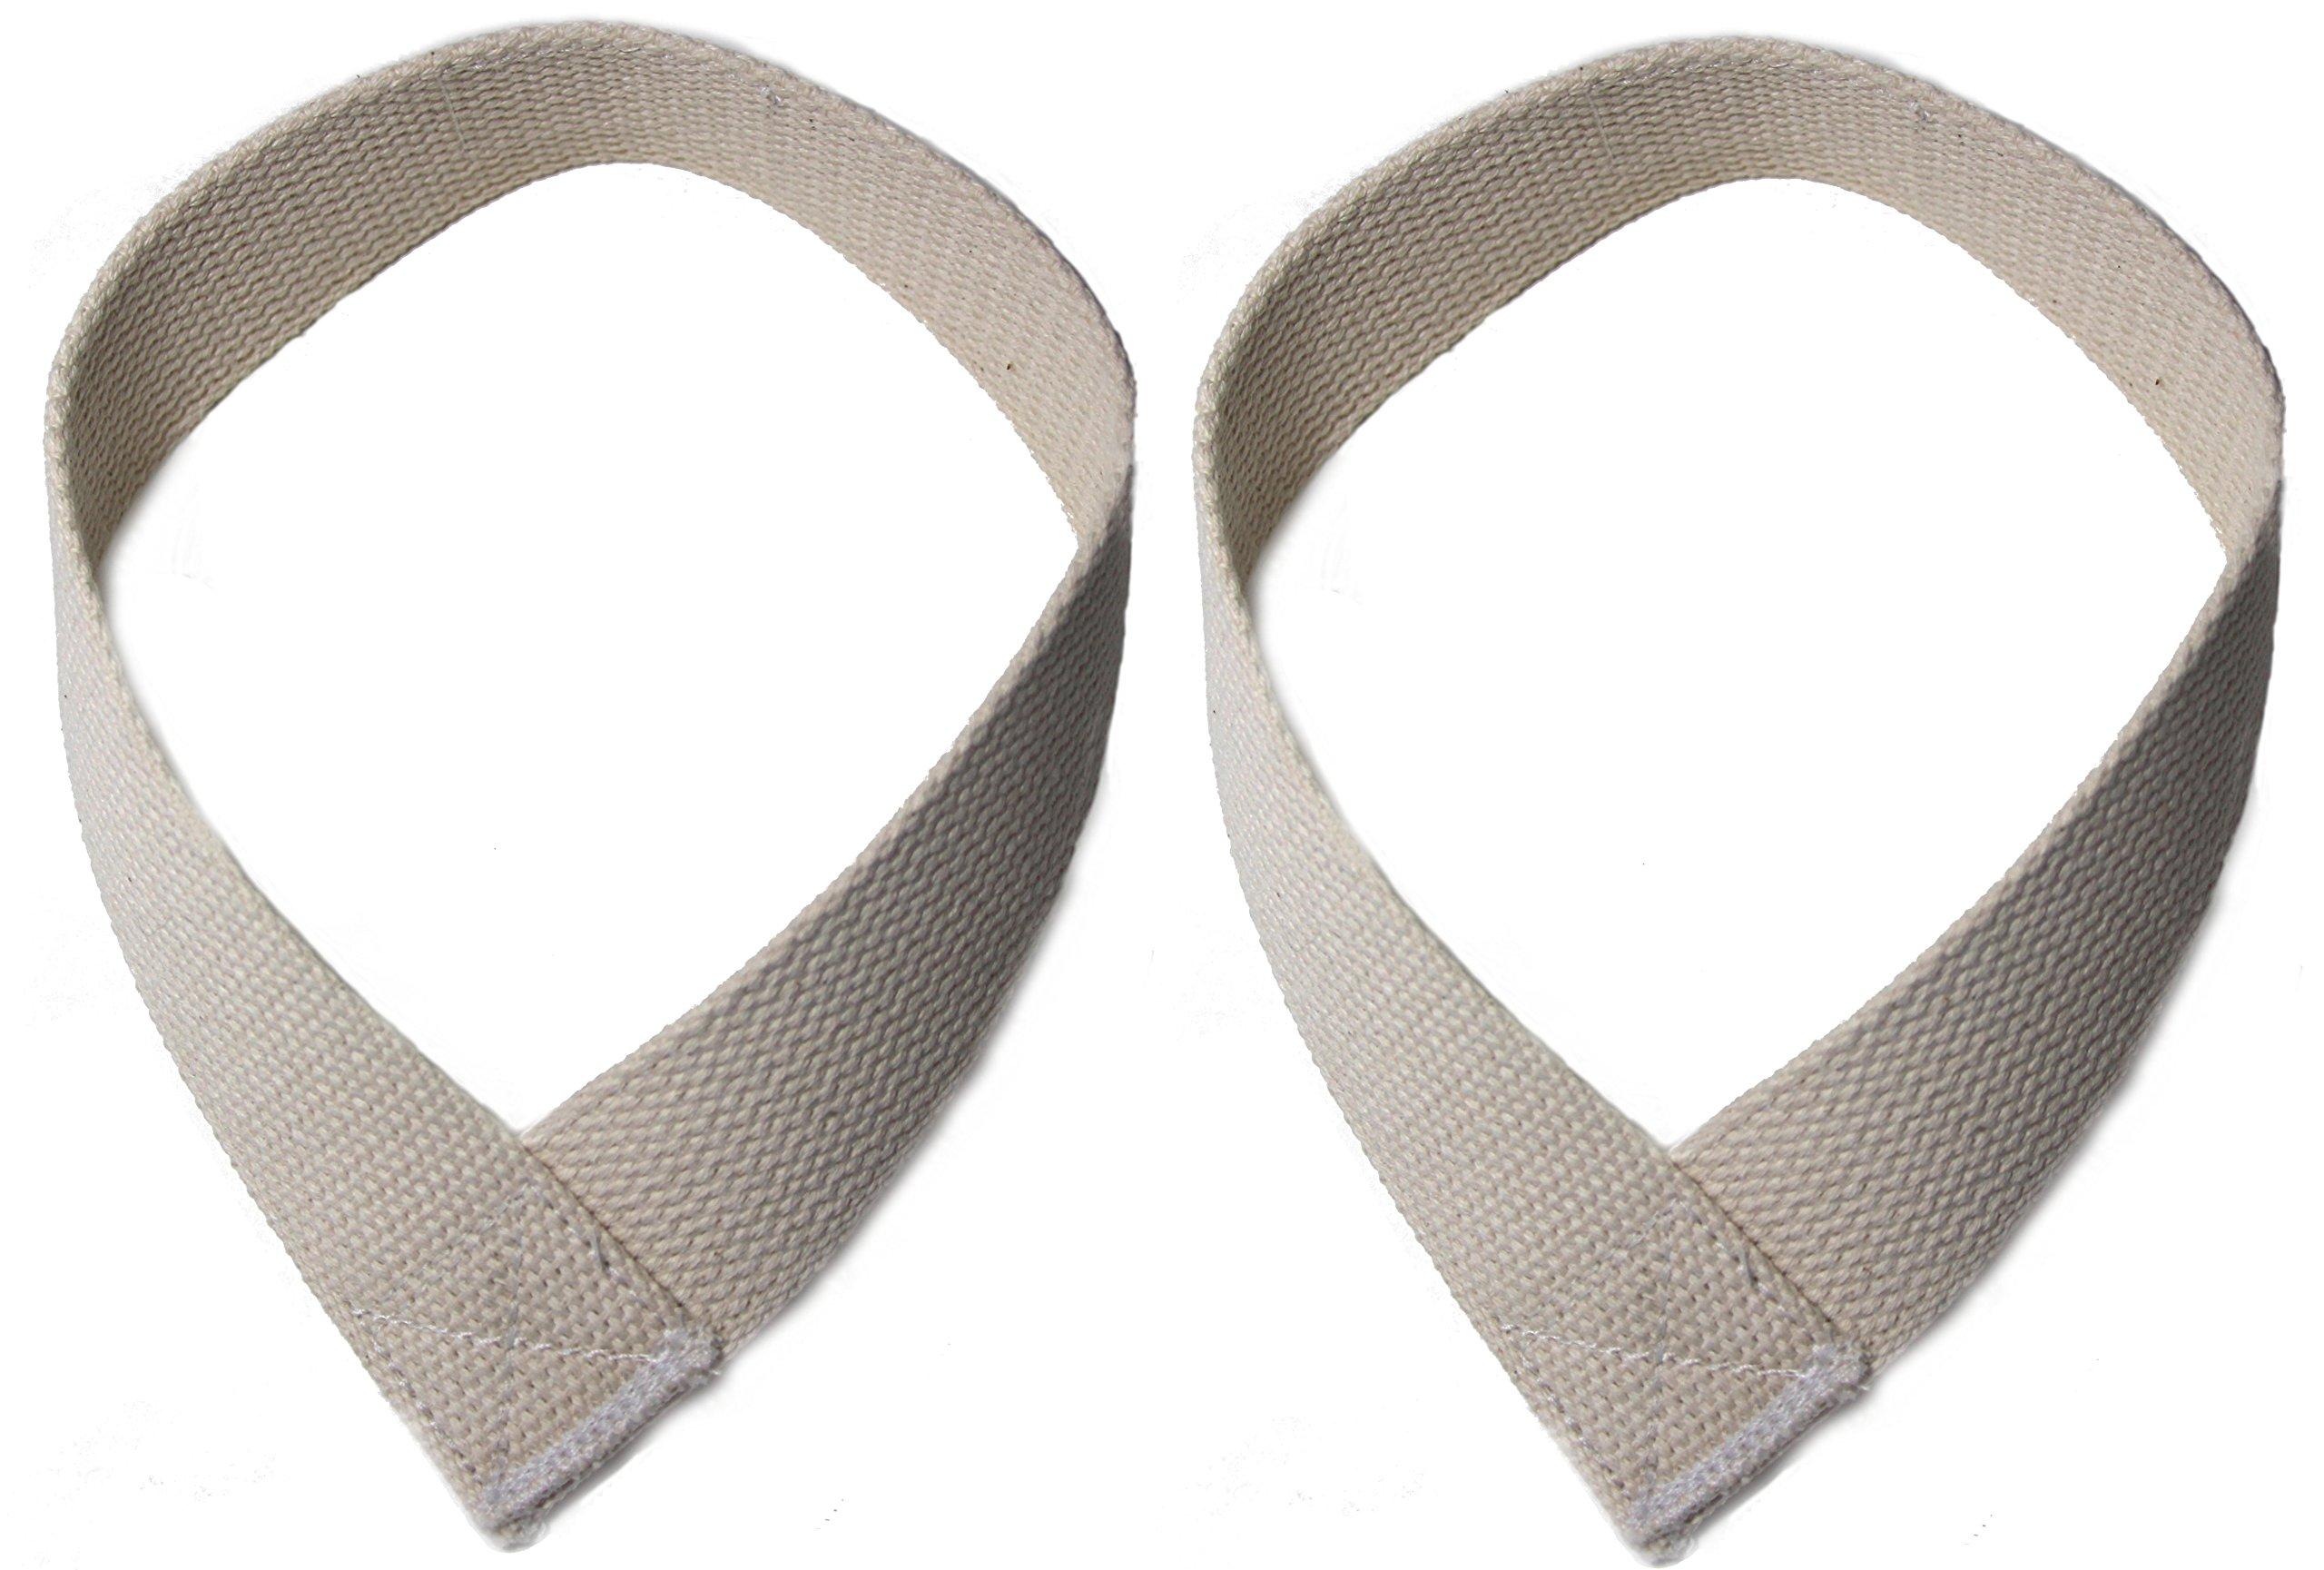 Serious Steel Heavy-Duty Speed Wrist Straps | White